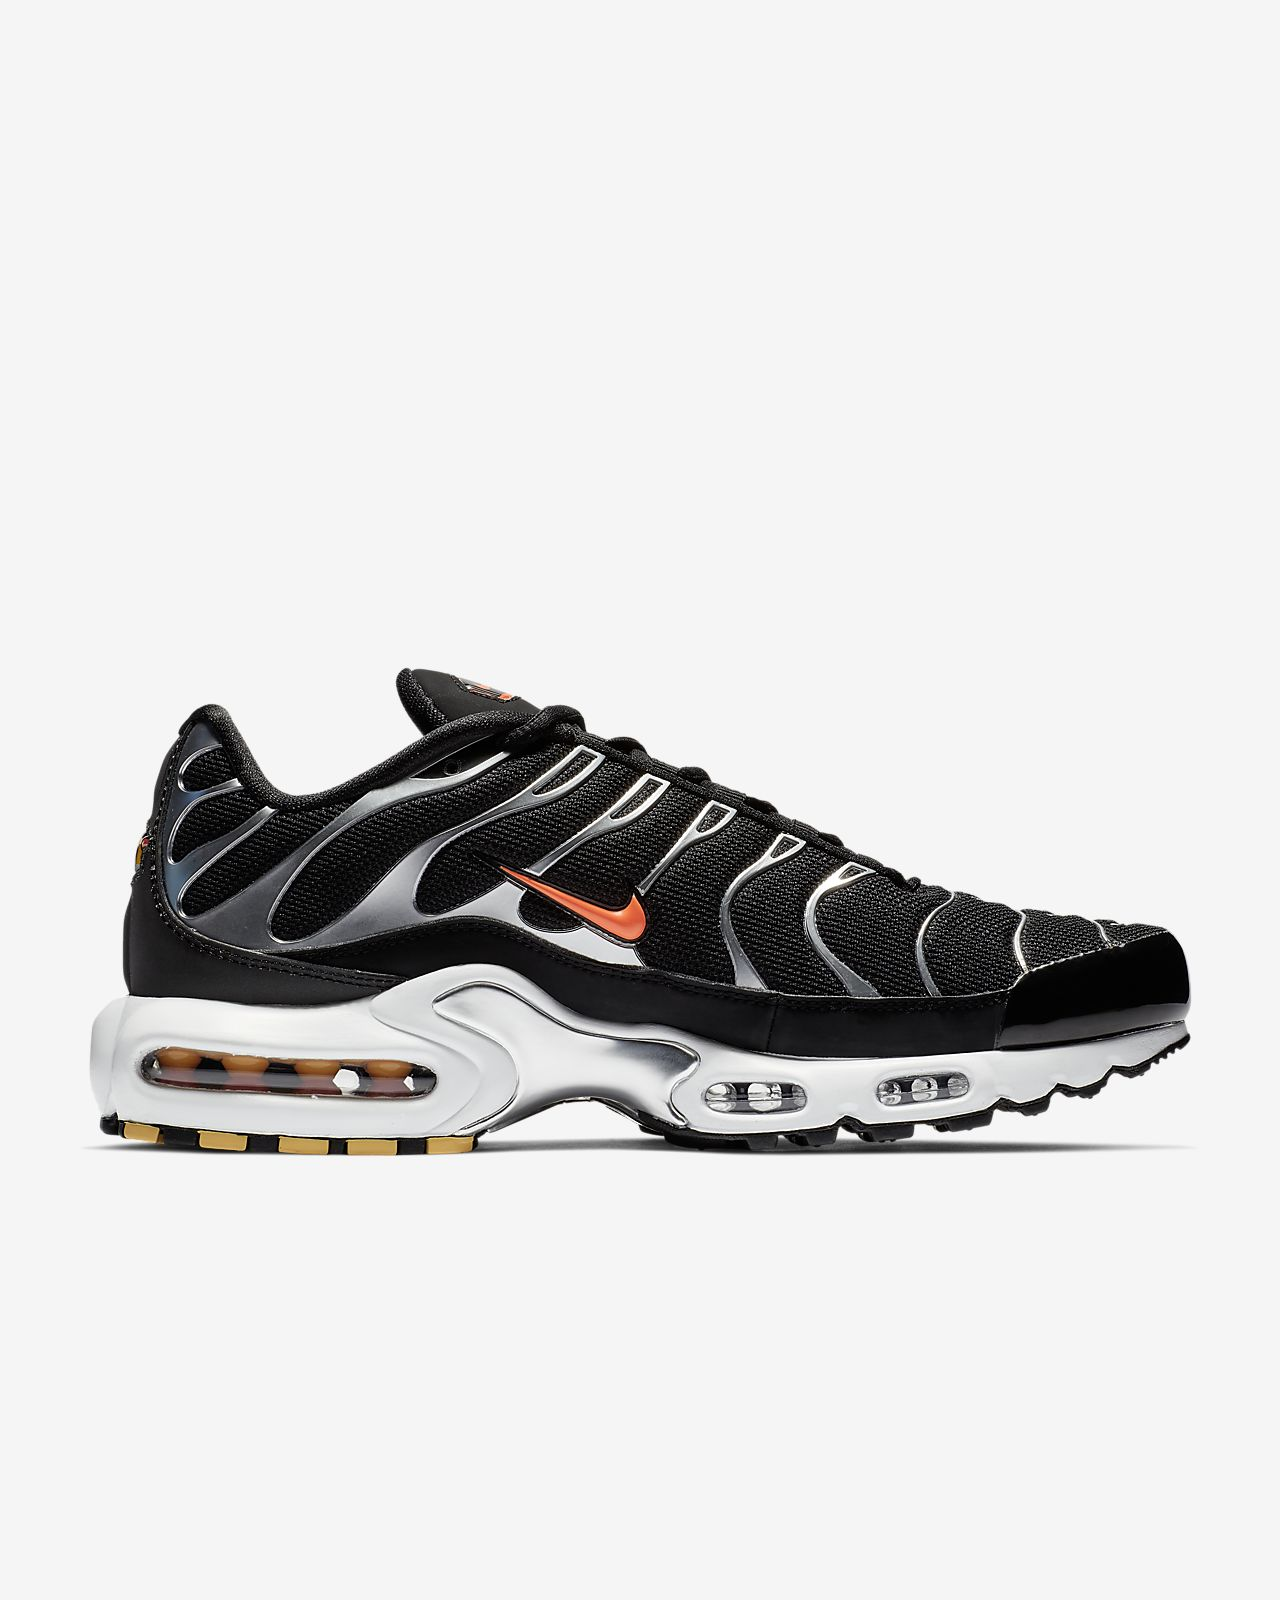 meet 137d0 b15ac ... Nike Air Max Plus TN SE Men s Shoe